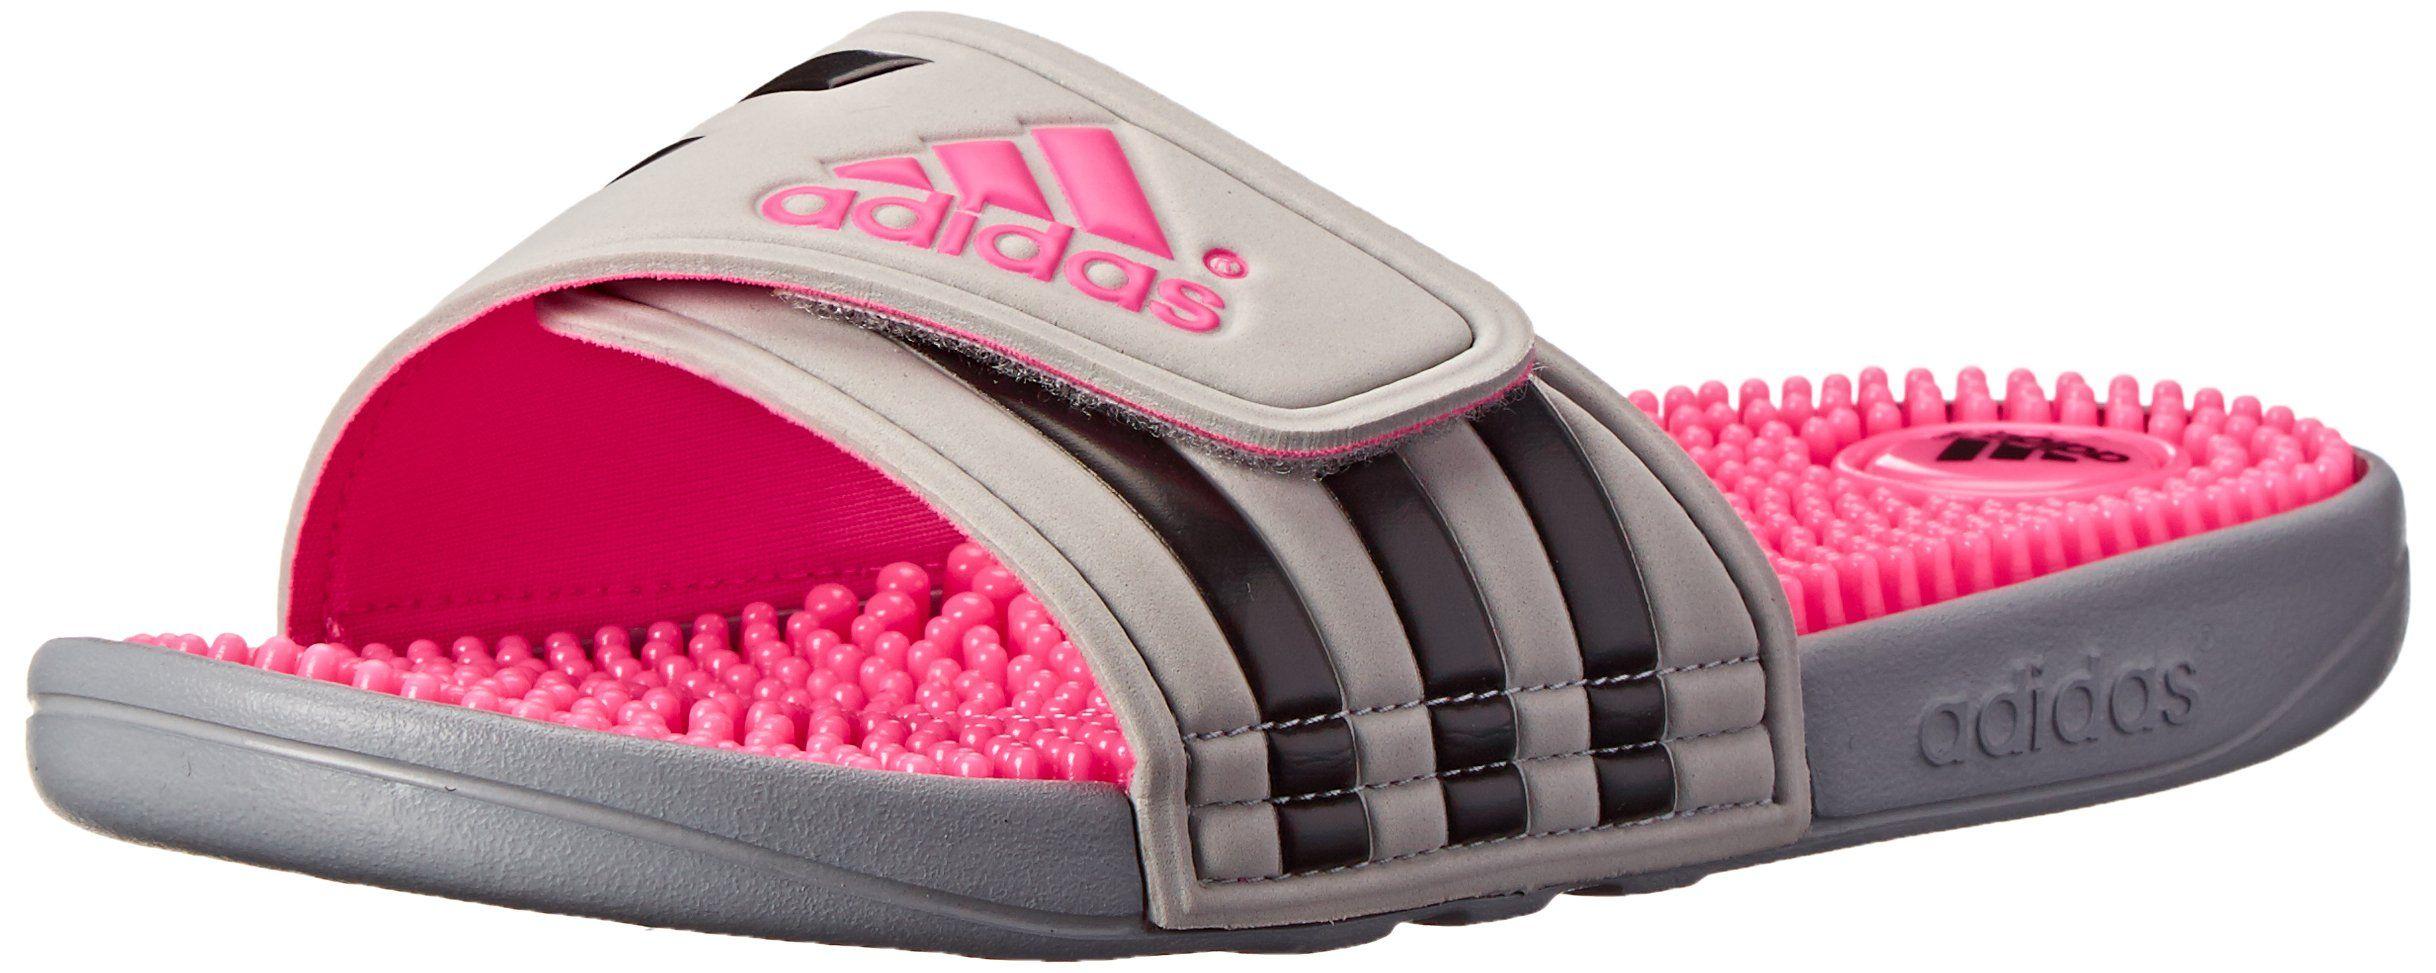 best website ff607 eec13 Amazon.com Adidas Womens Adissage Slide Clothing